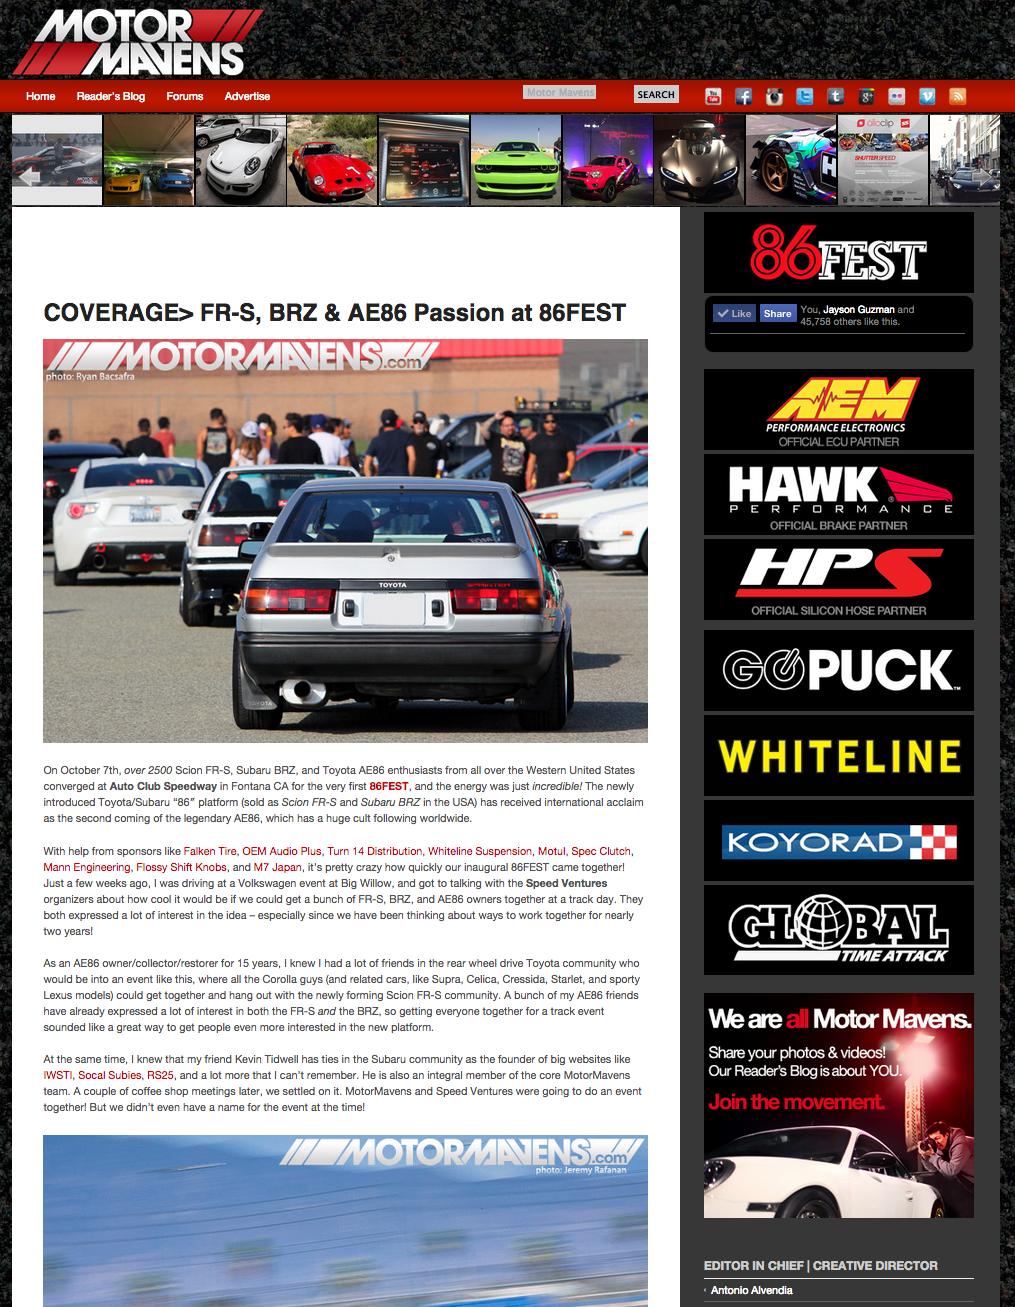 86FEST, AE86, Auto Club Speedway, MotorMavens